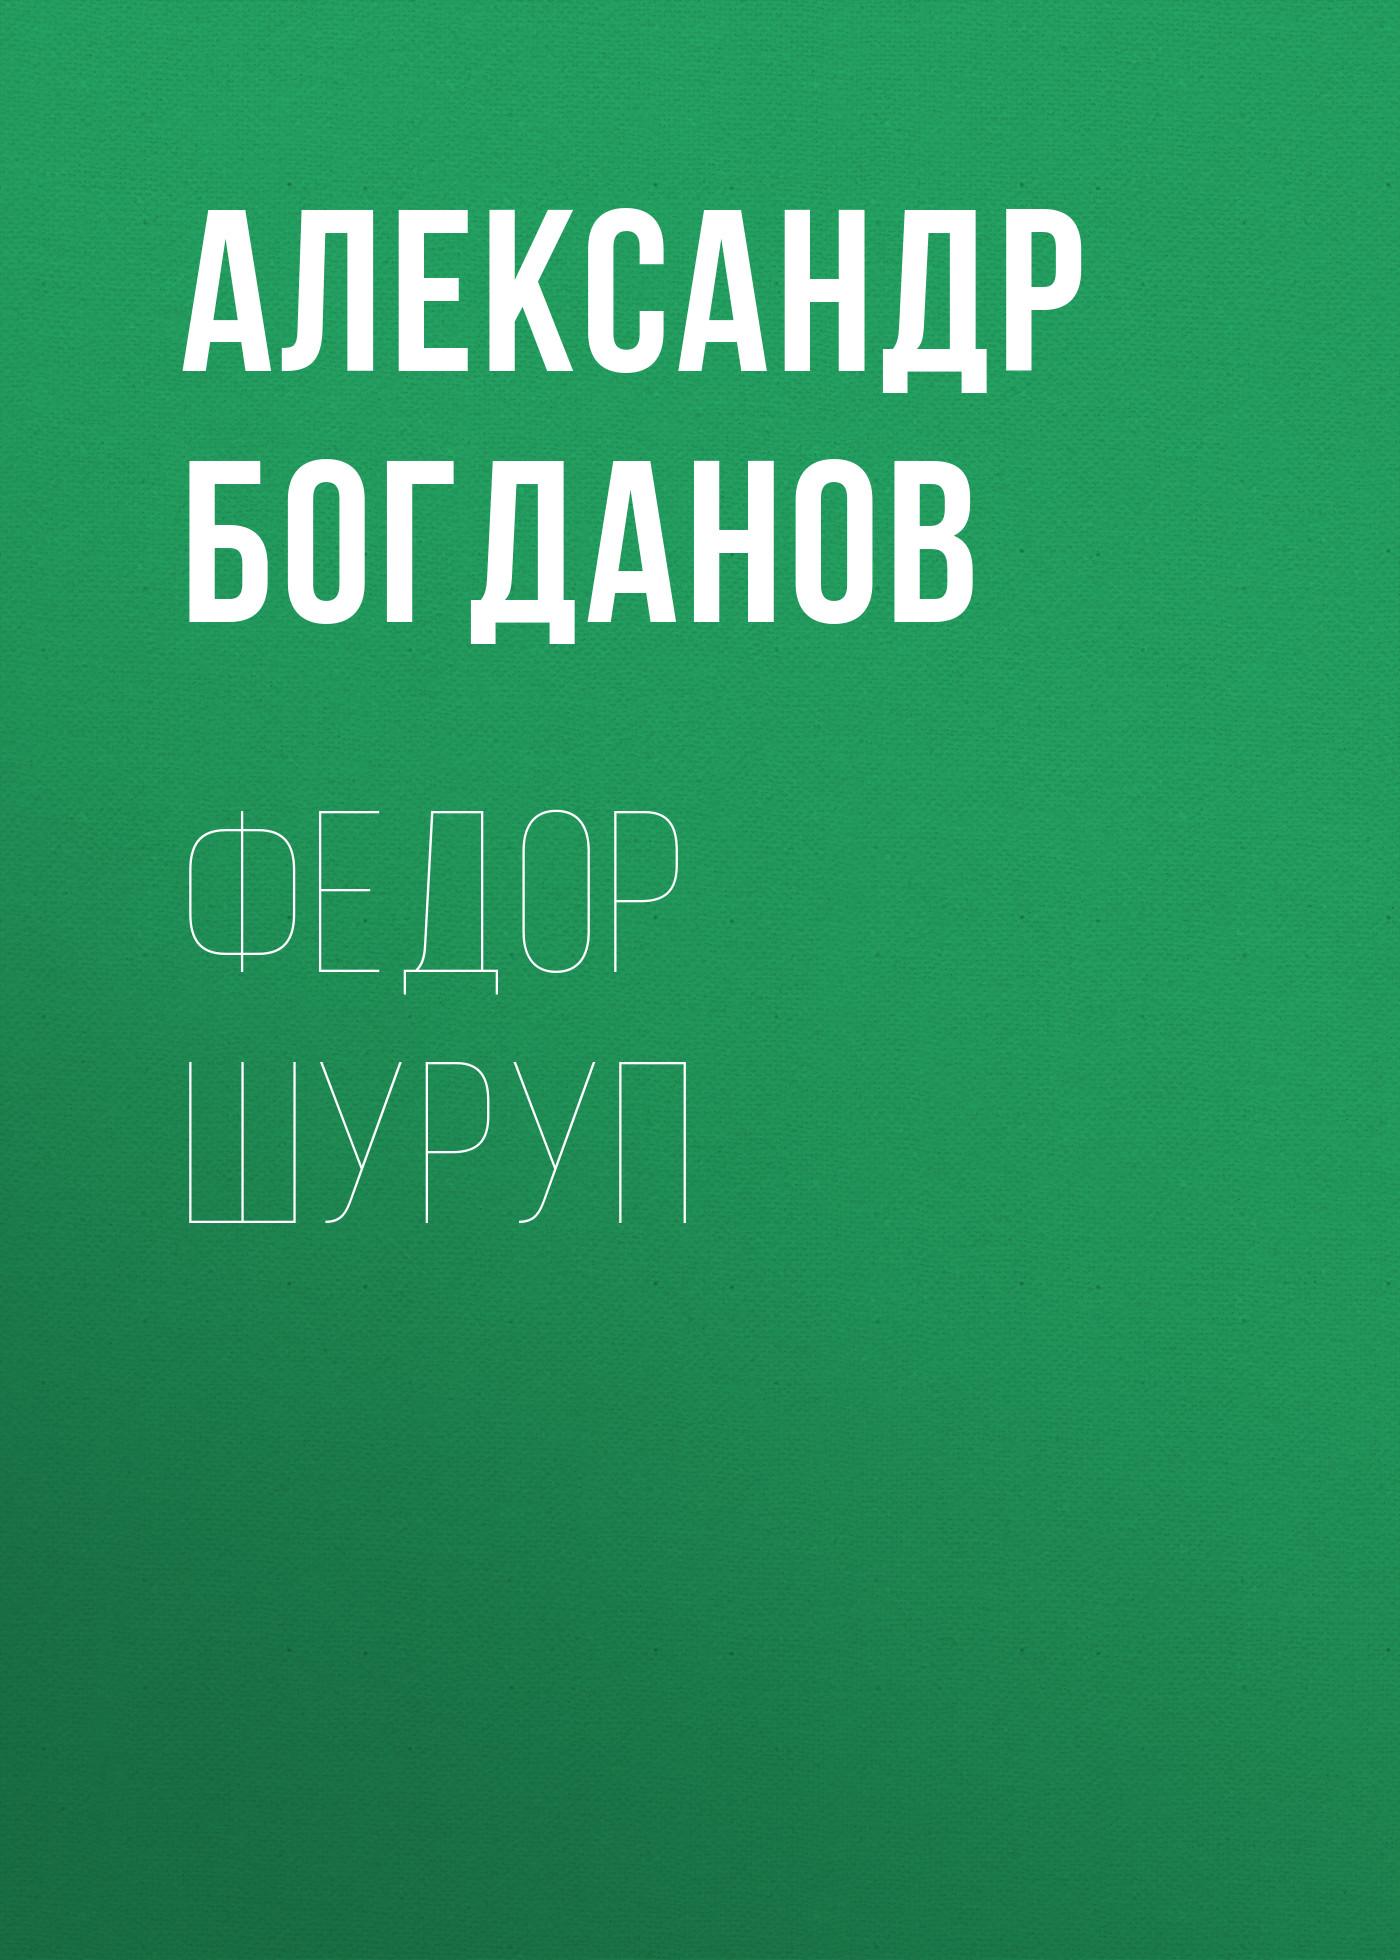 Купить книгу Федор Шуруп, автора Александра Богданова